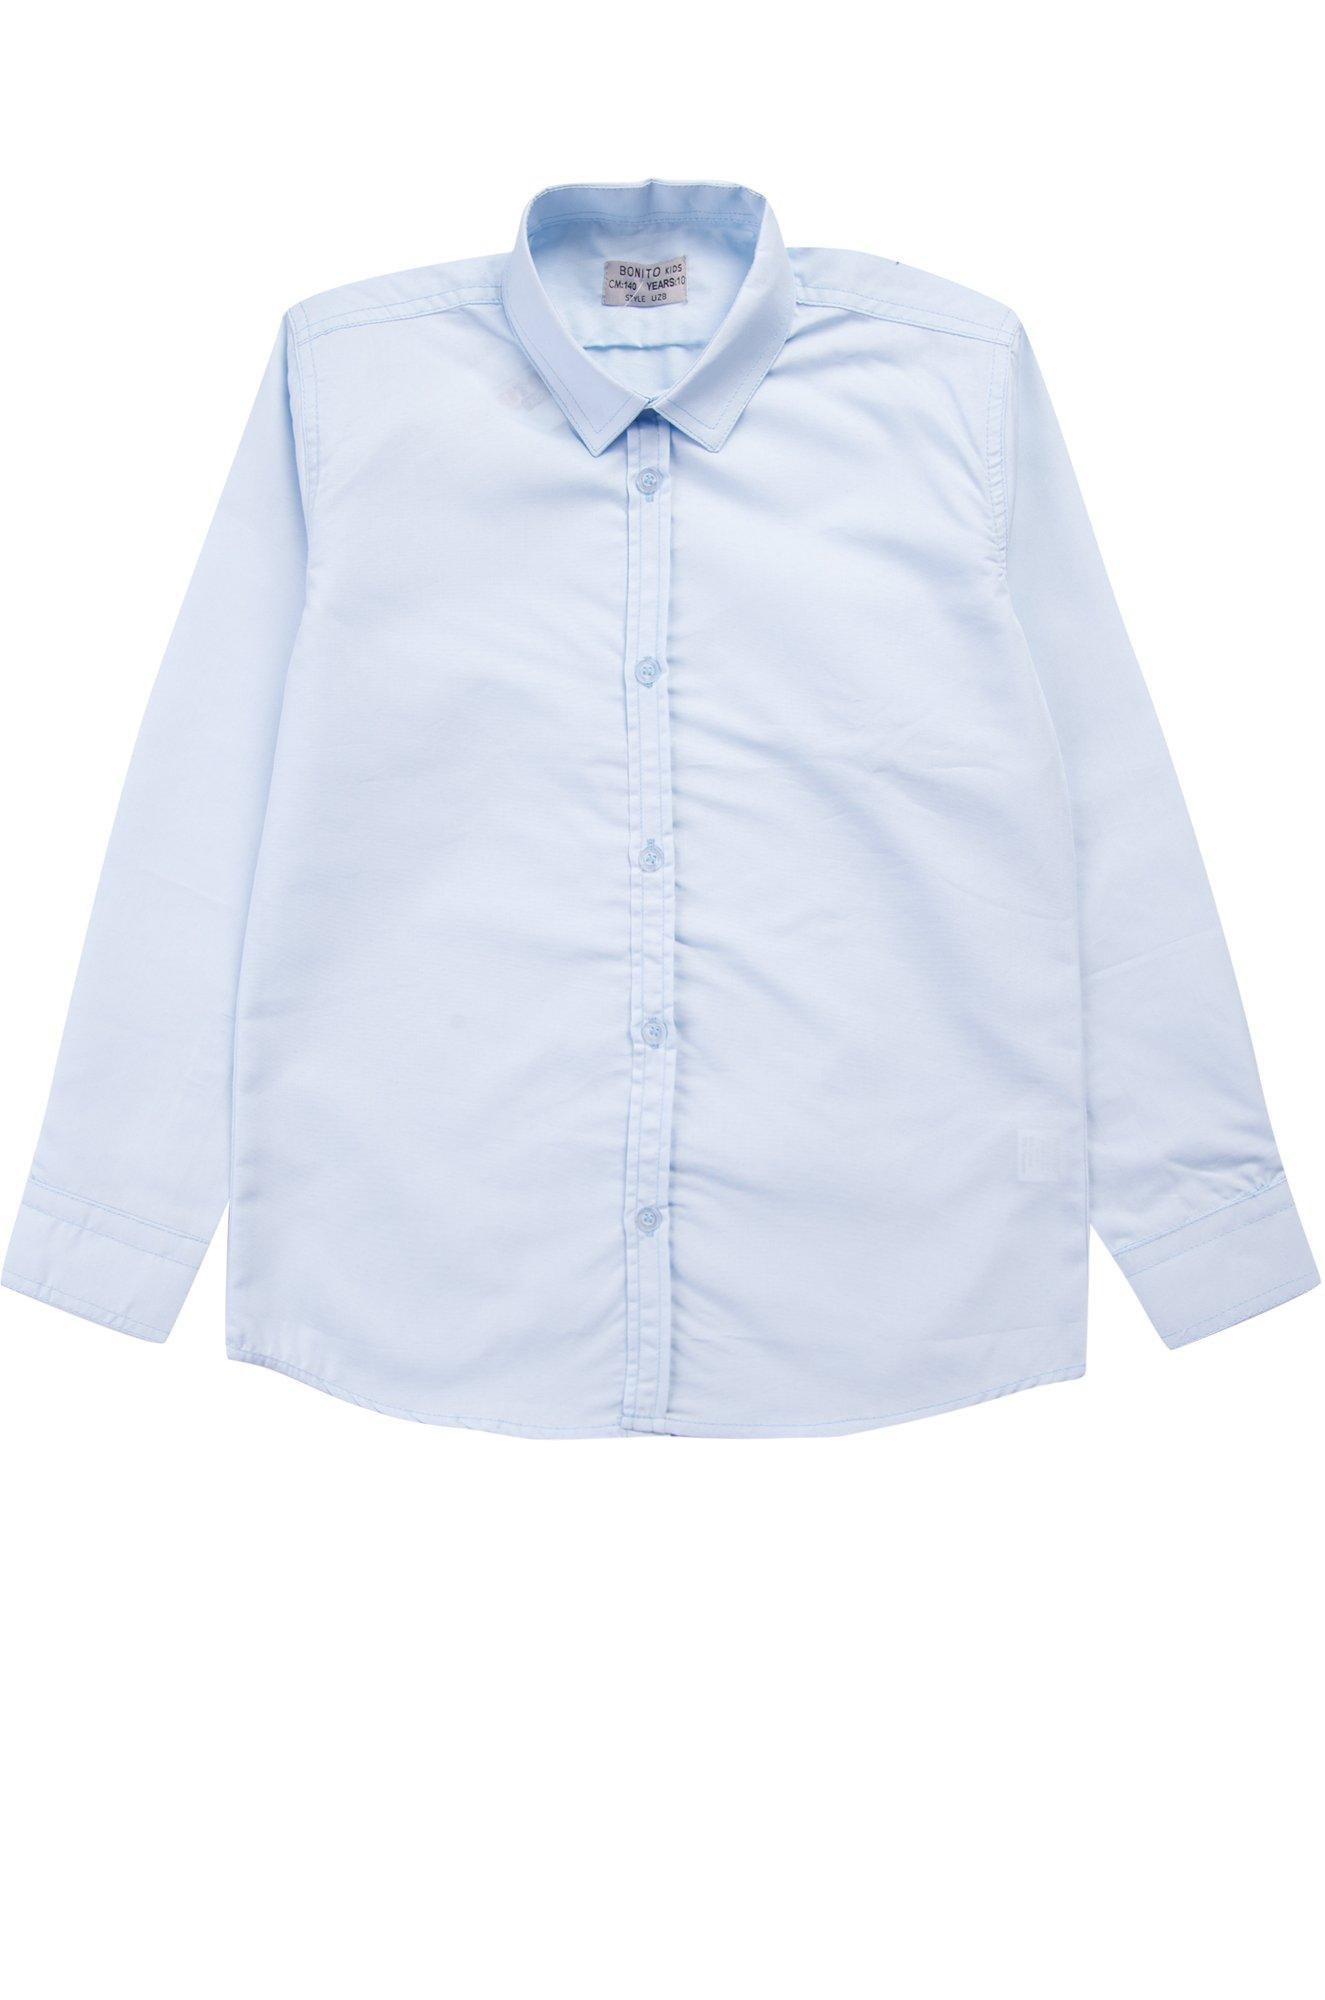 Bonito, Рубашка для мальчика Bonito P1197 (1579794962)